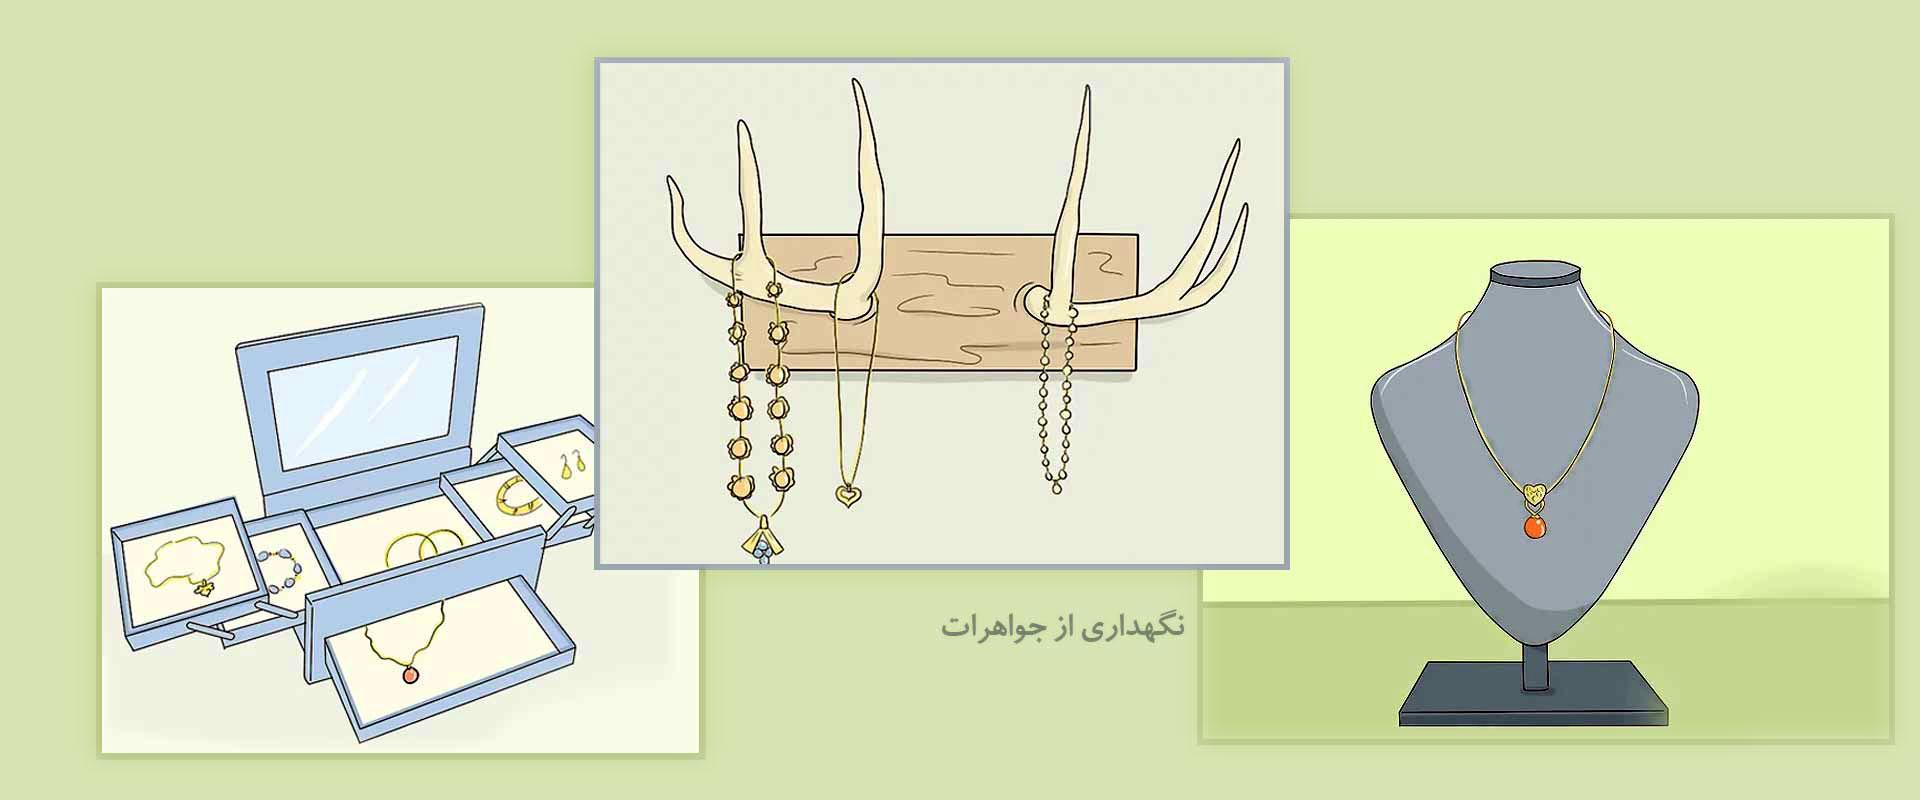 Store Jewelry d2 - نگهداری از جواهرات